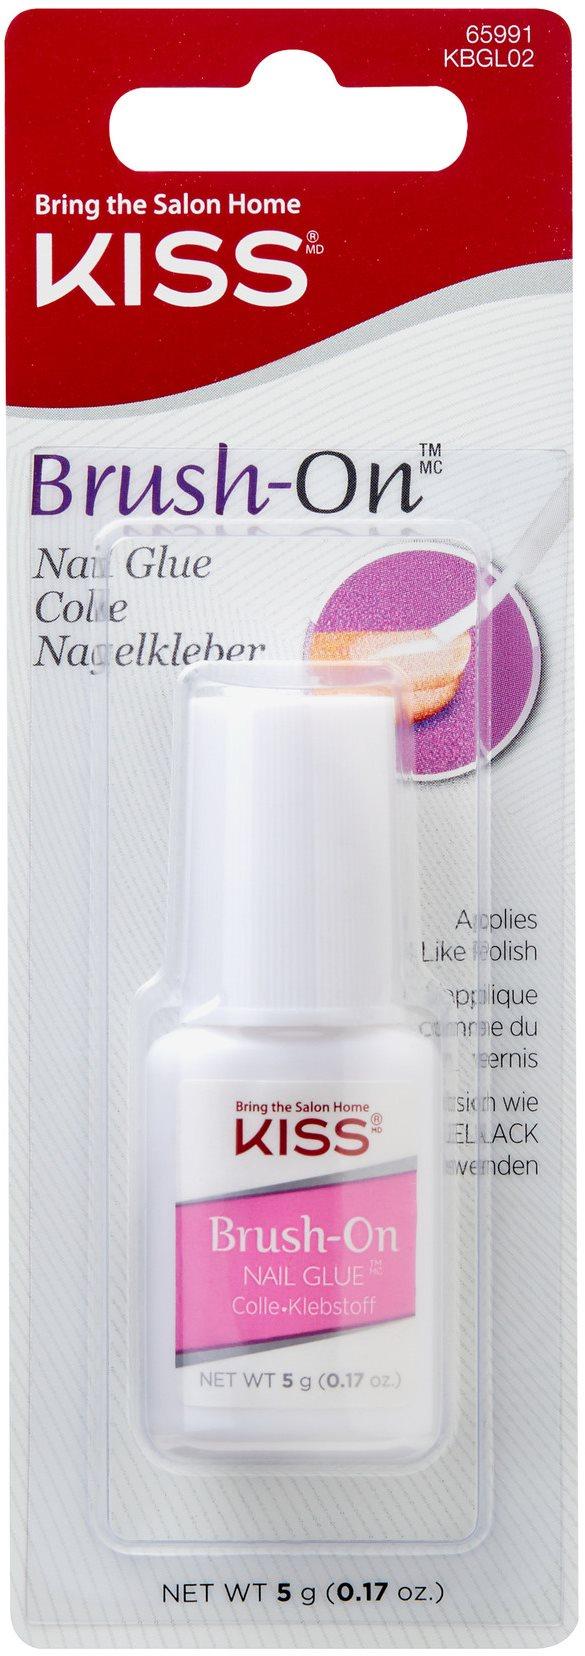 KISS Brush-On Nail Glue